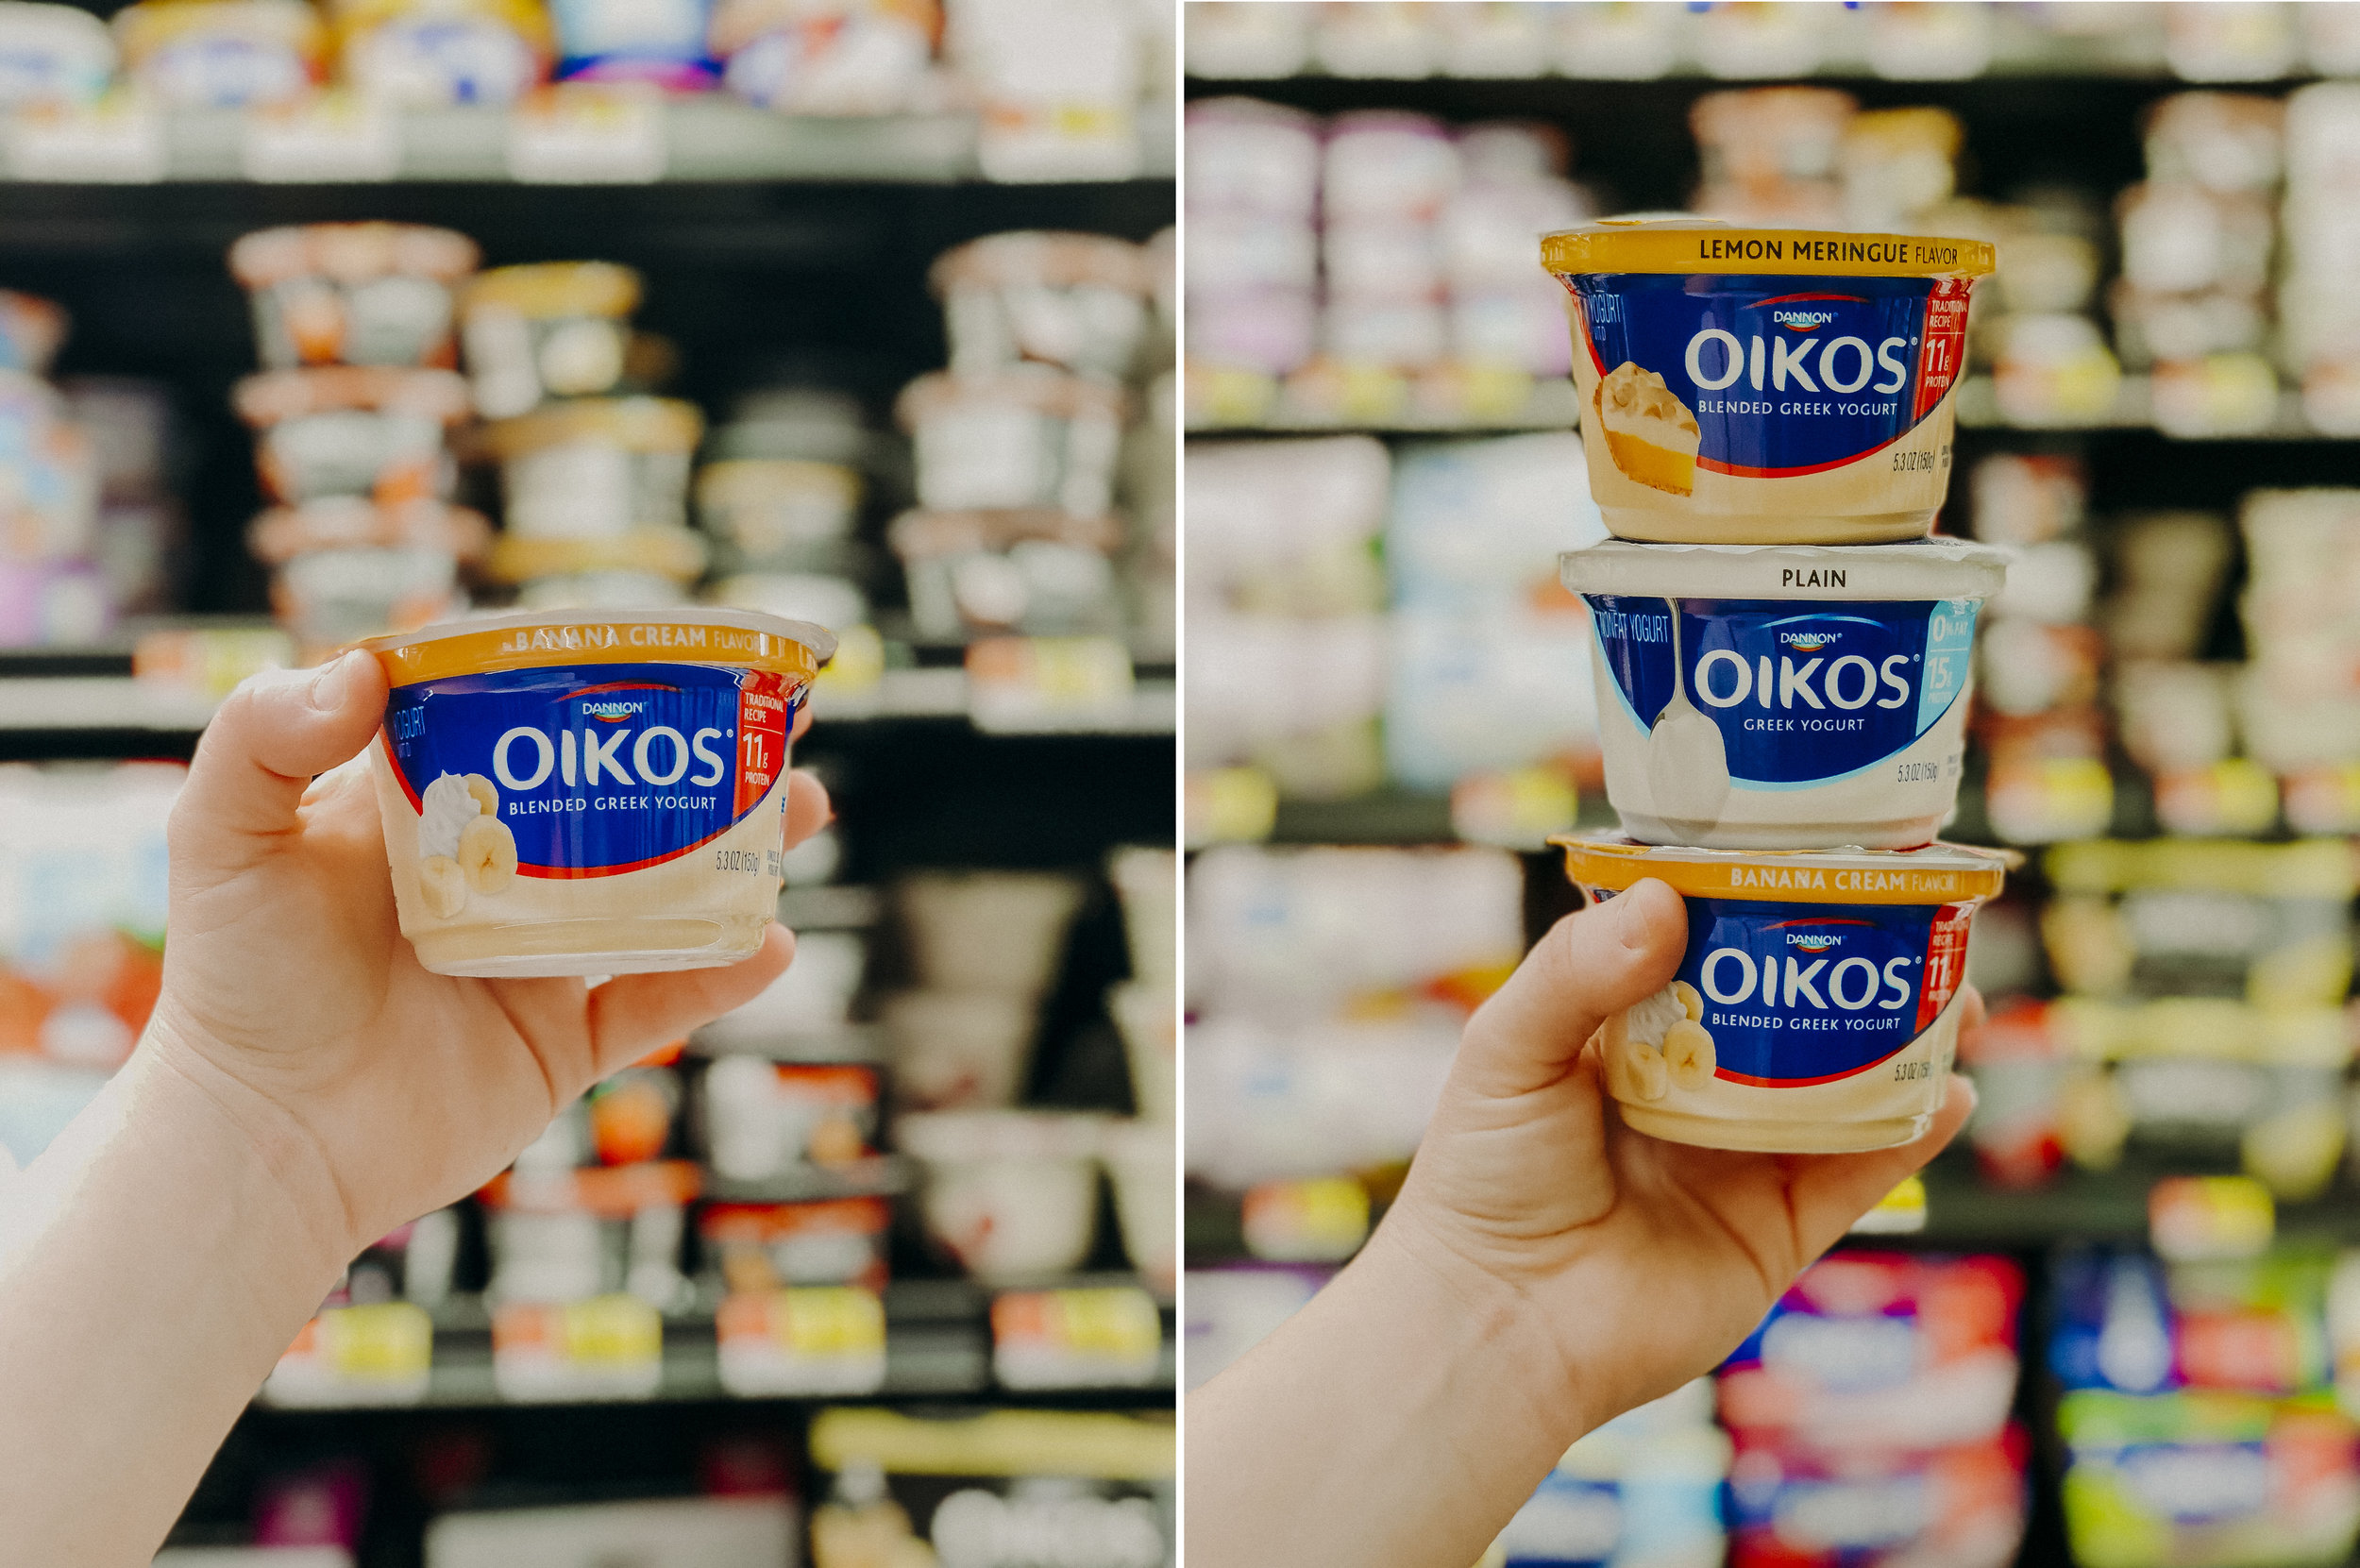 oikos-greek-yogurt-camping-breakfast-ideas.jpg